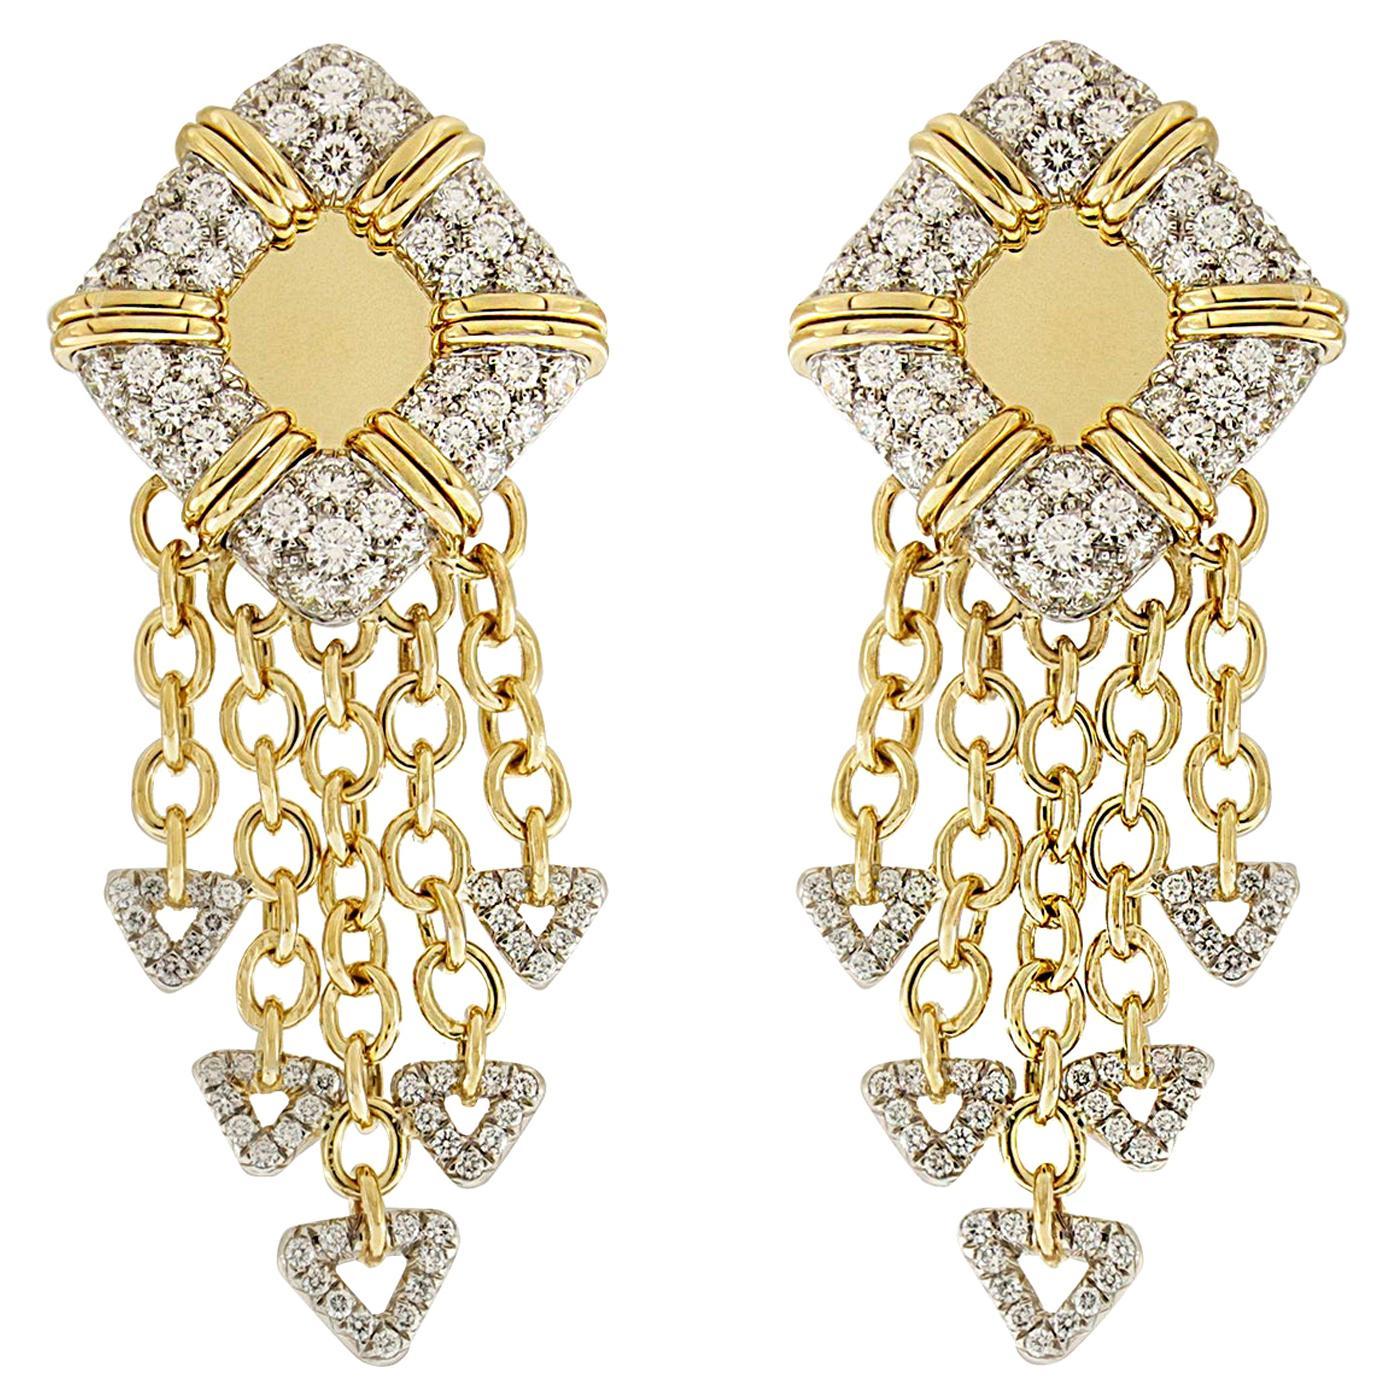 Valentin Magro Yellow Gold White Gold Life Saver Diamond Earrings